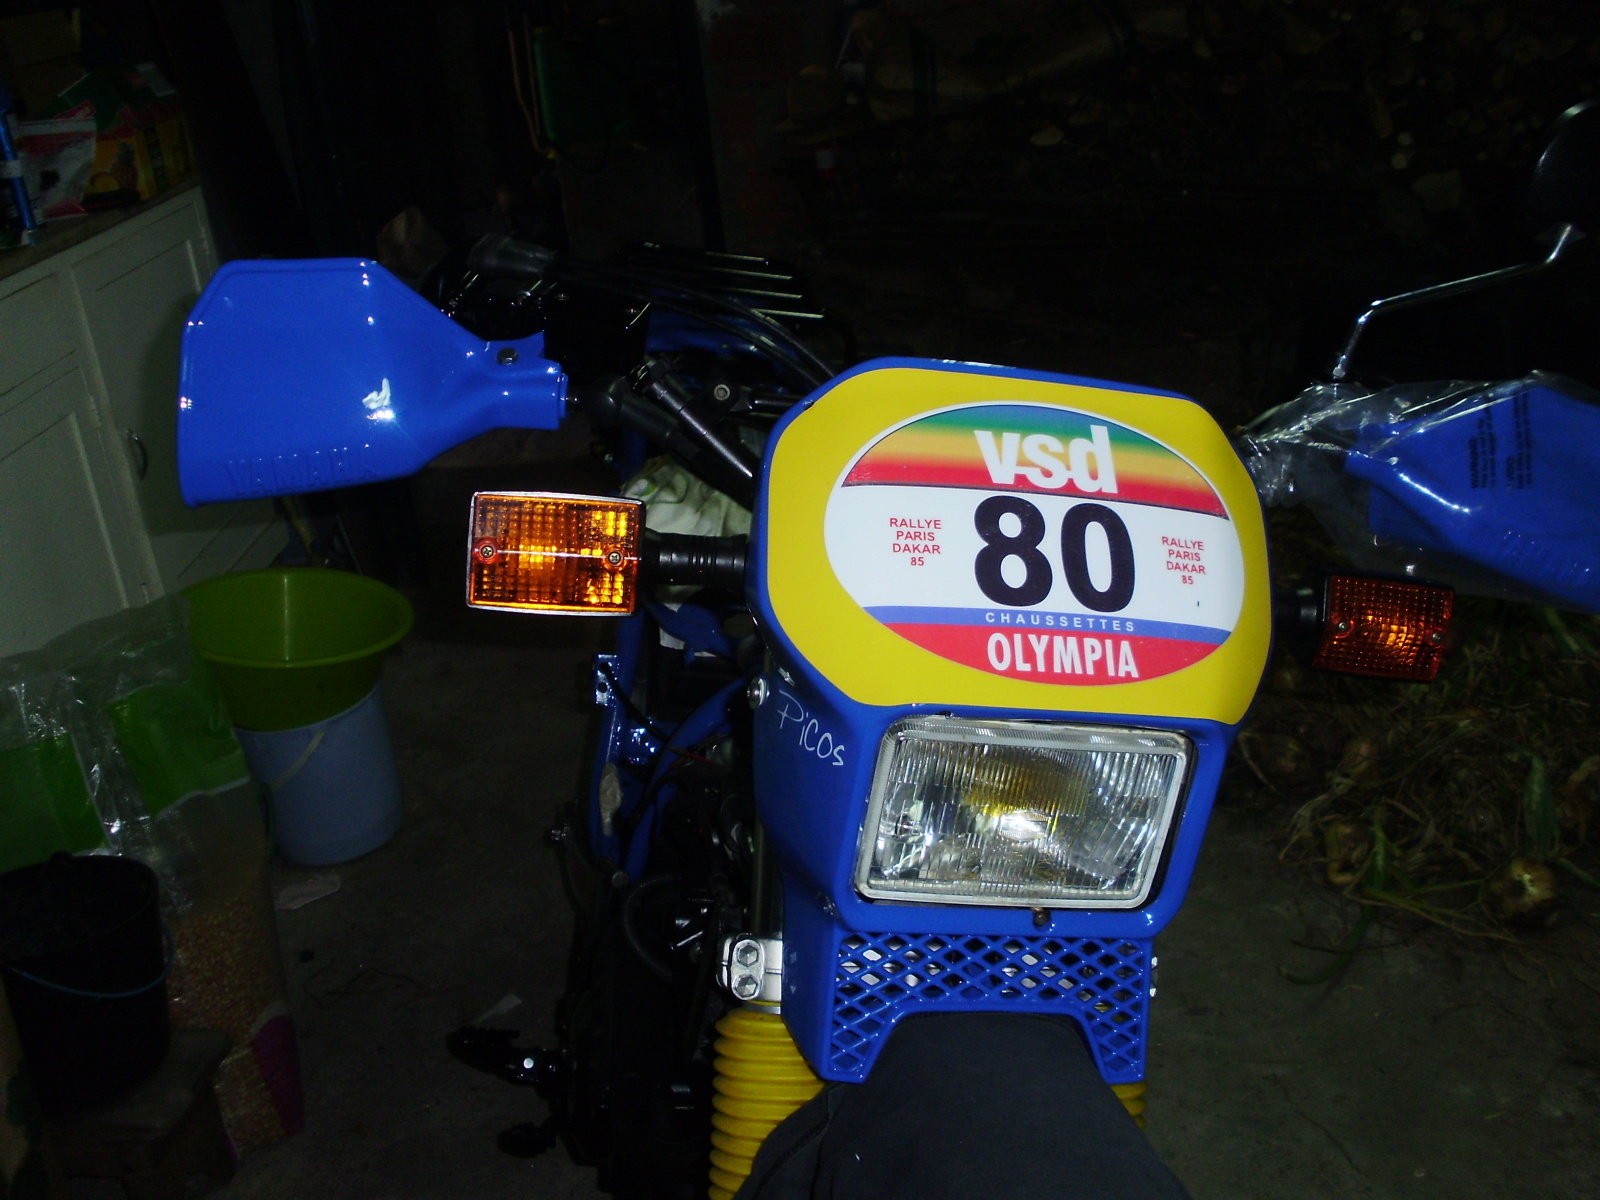 Yamaha xt600z Tenere replica dakar 1985 ( Jean Claude Olivier ) - Página 4 1zoguo0